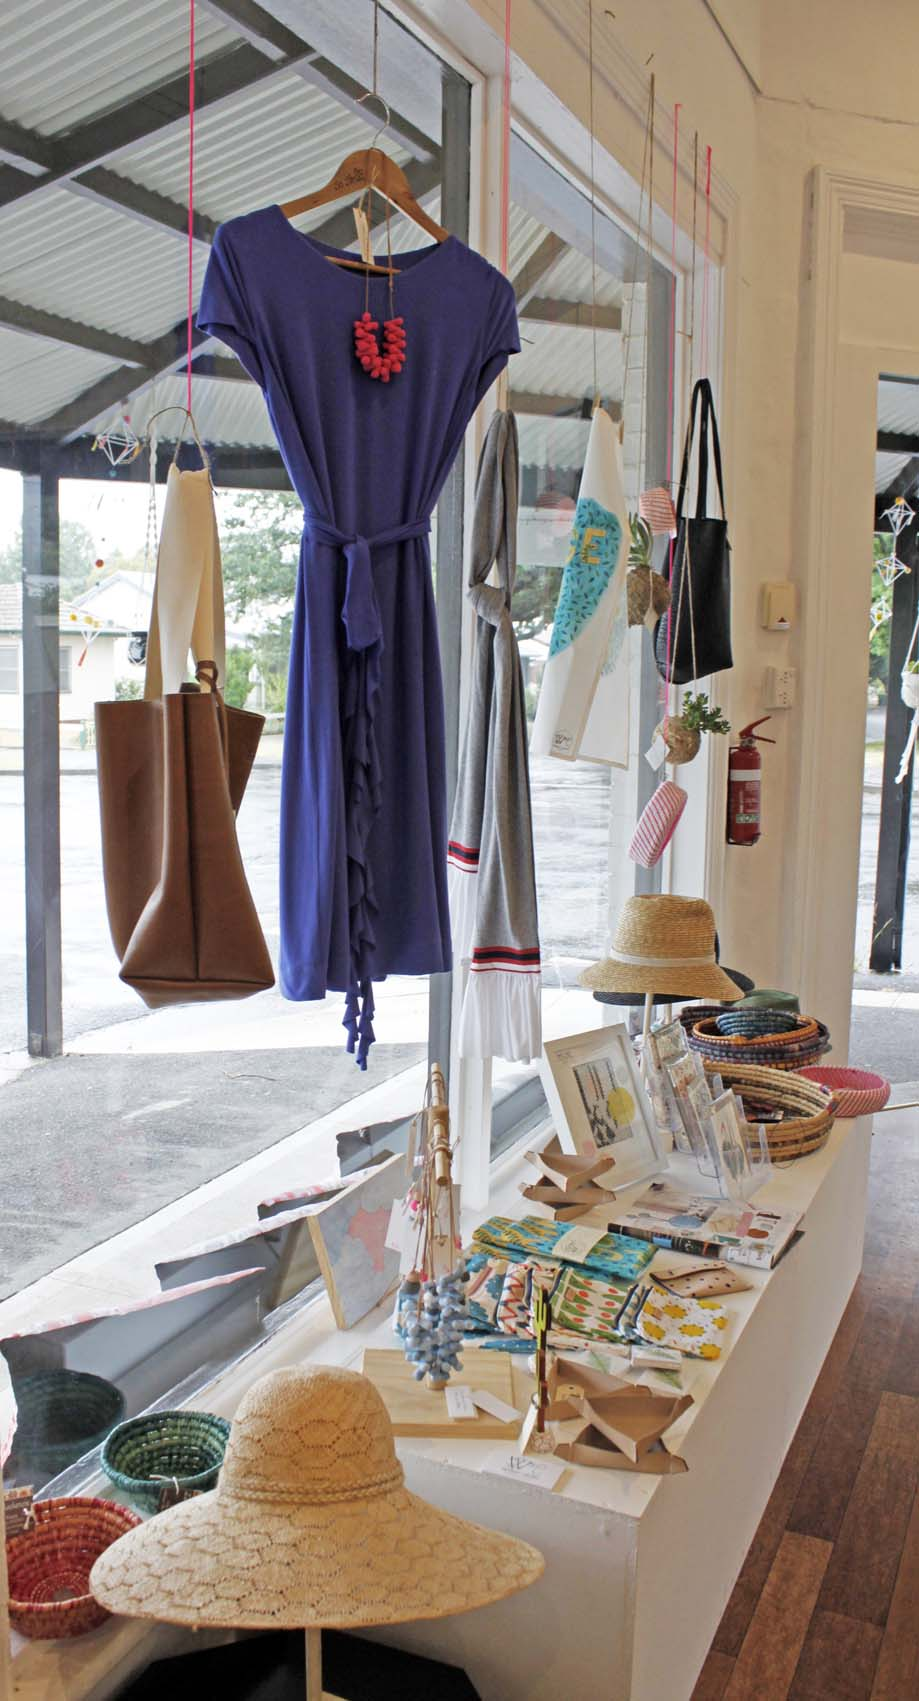 The Journey Person Handmade Market, The Corner Store Gallery, Orange NSW